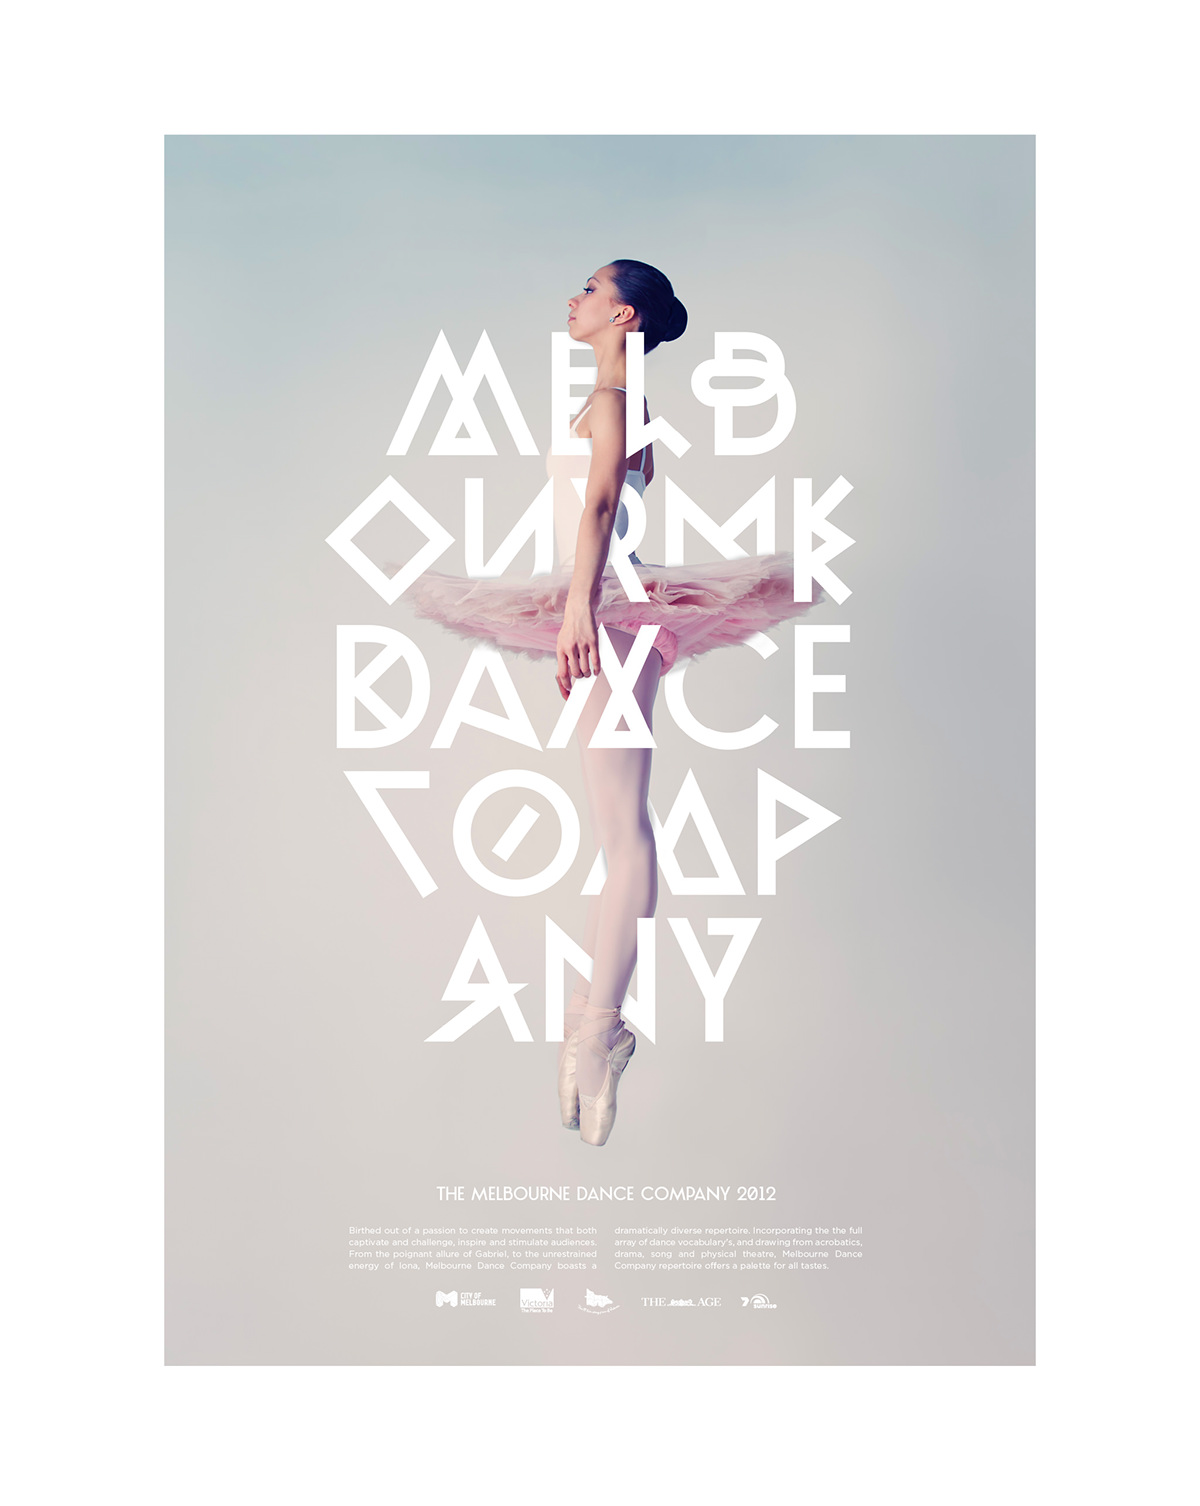 Adobe Portfolio Melbourne company ballet pink type ballerina White jump experimental new Australia dancing woman girl symmetry symmetrical line